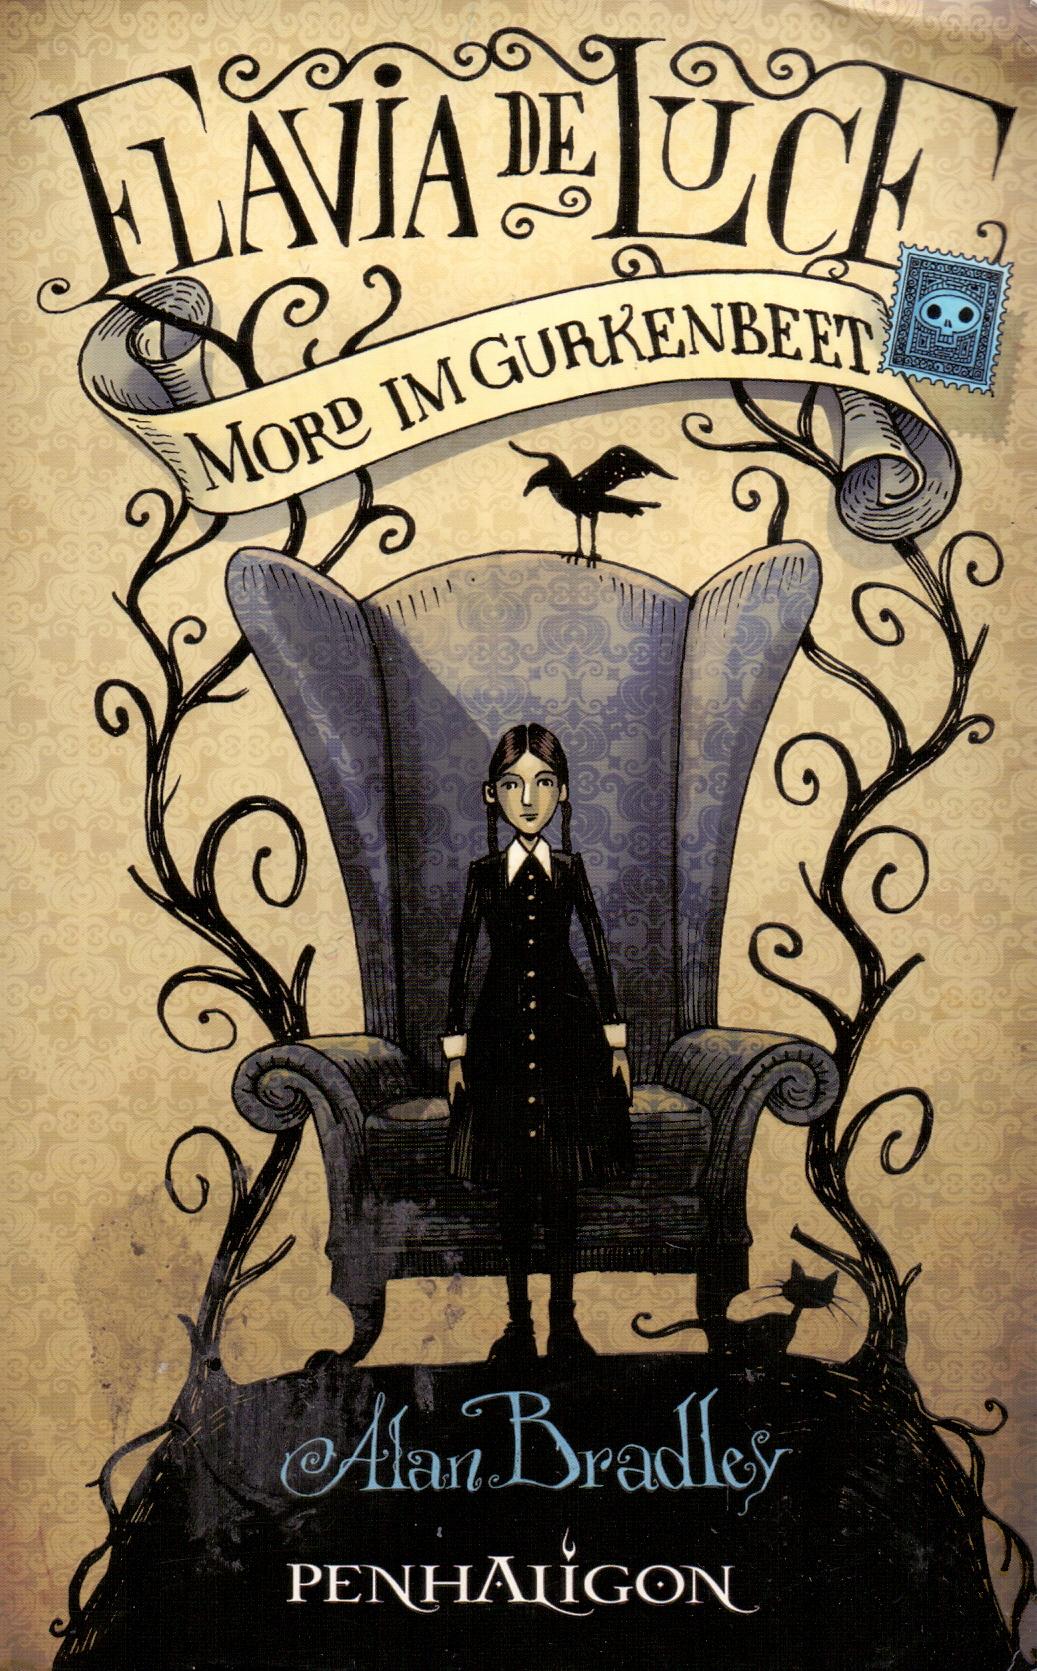 Flavia de Luce: Band 1 - Mord im Gurkenbeet - Alan Bradley [Taschenbuch]